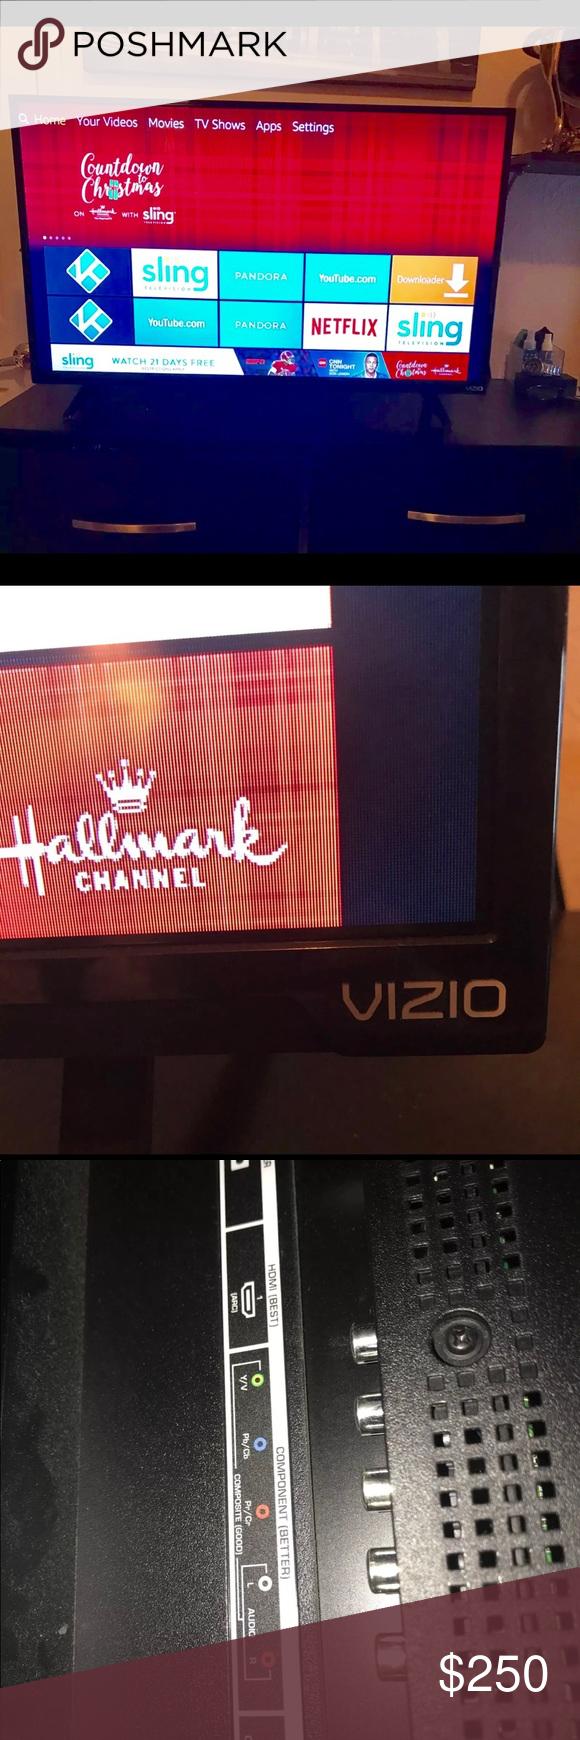 Vizio 43 inch HD TV Like new, this tv has sharp picture